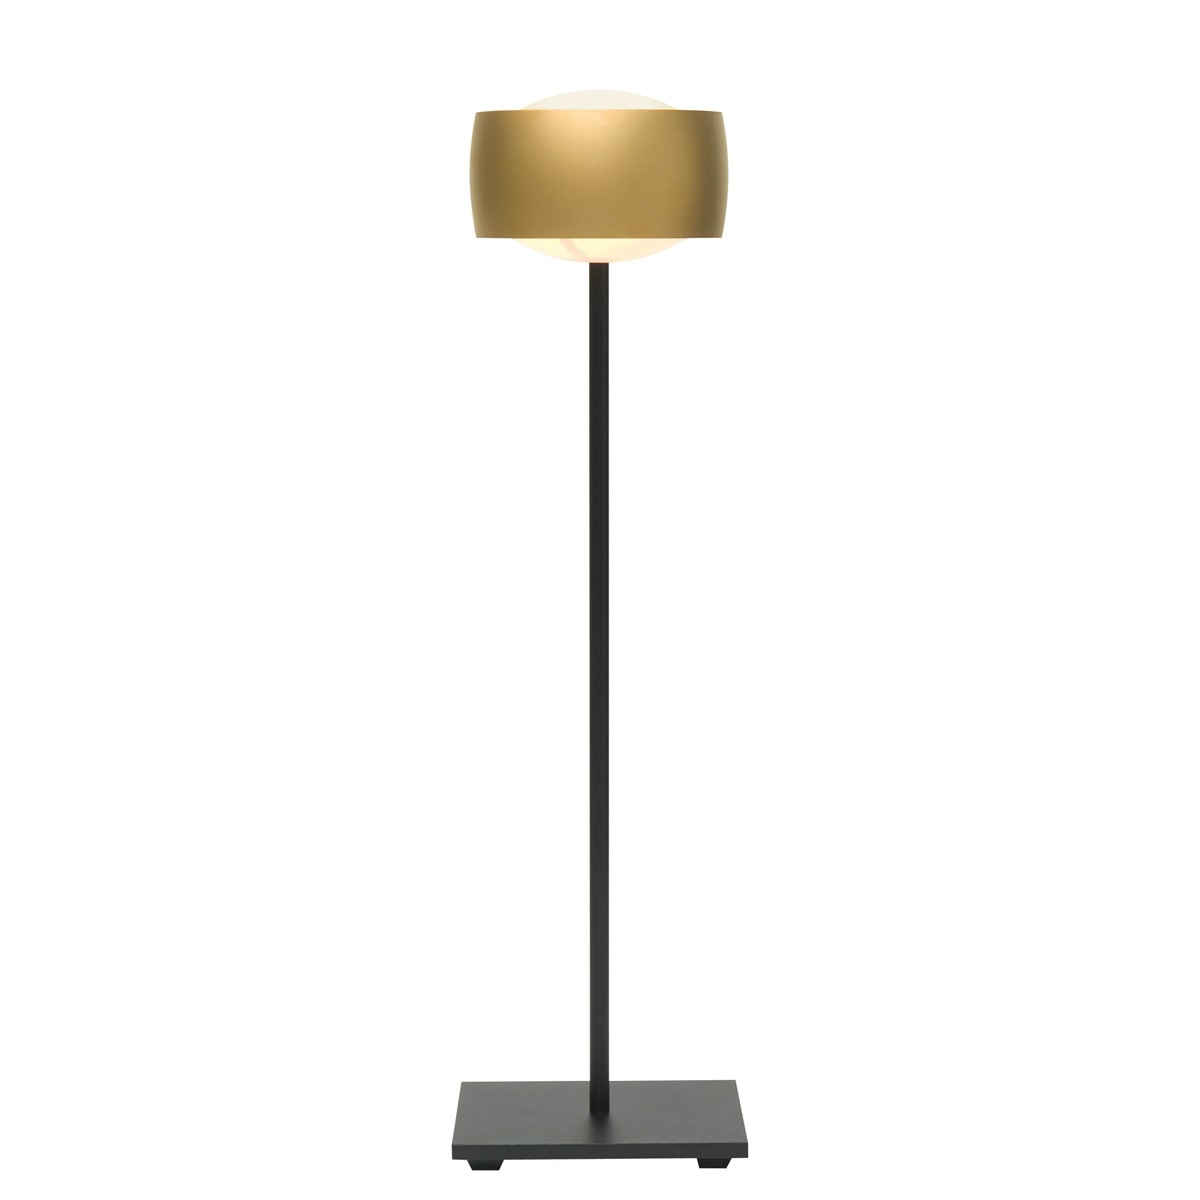 Oligo Grace LED Tischleuchte, Gold matt